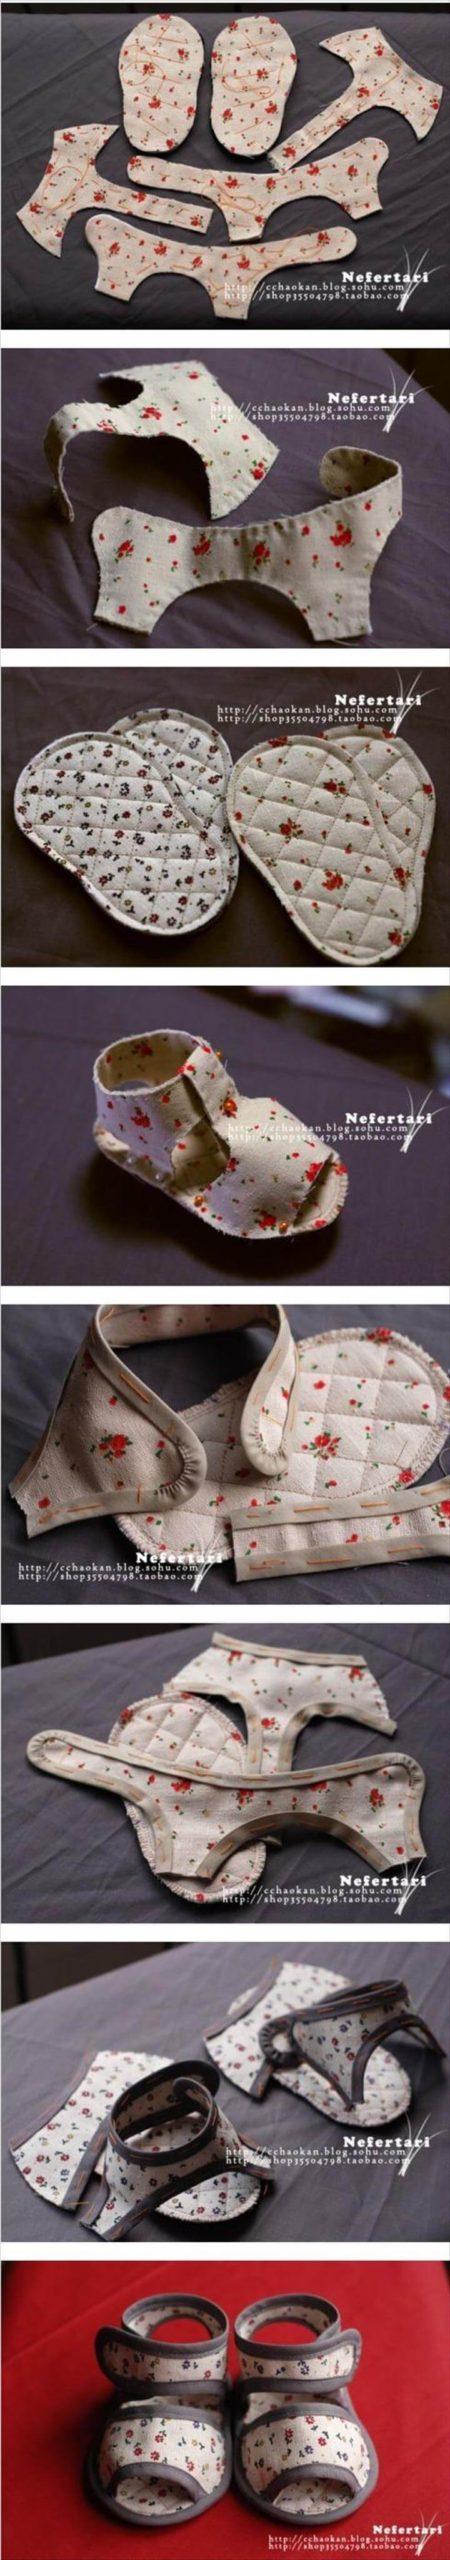 impresionantes sandalias de bebé hechas a mano